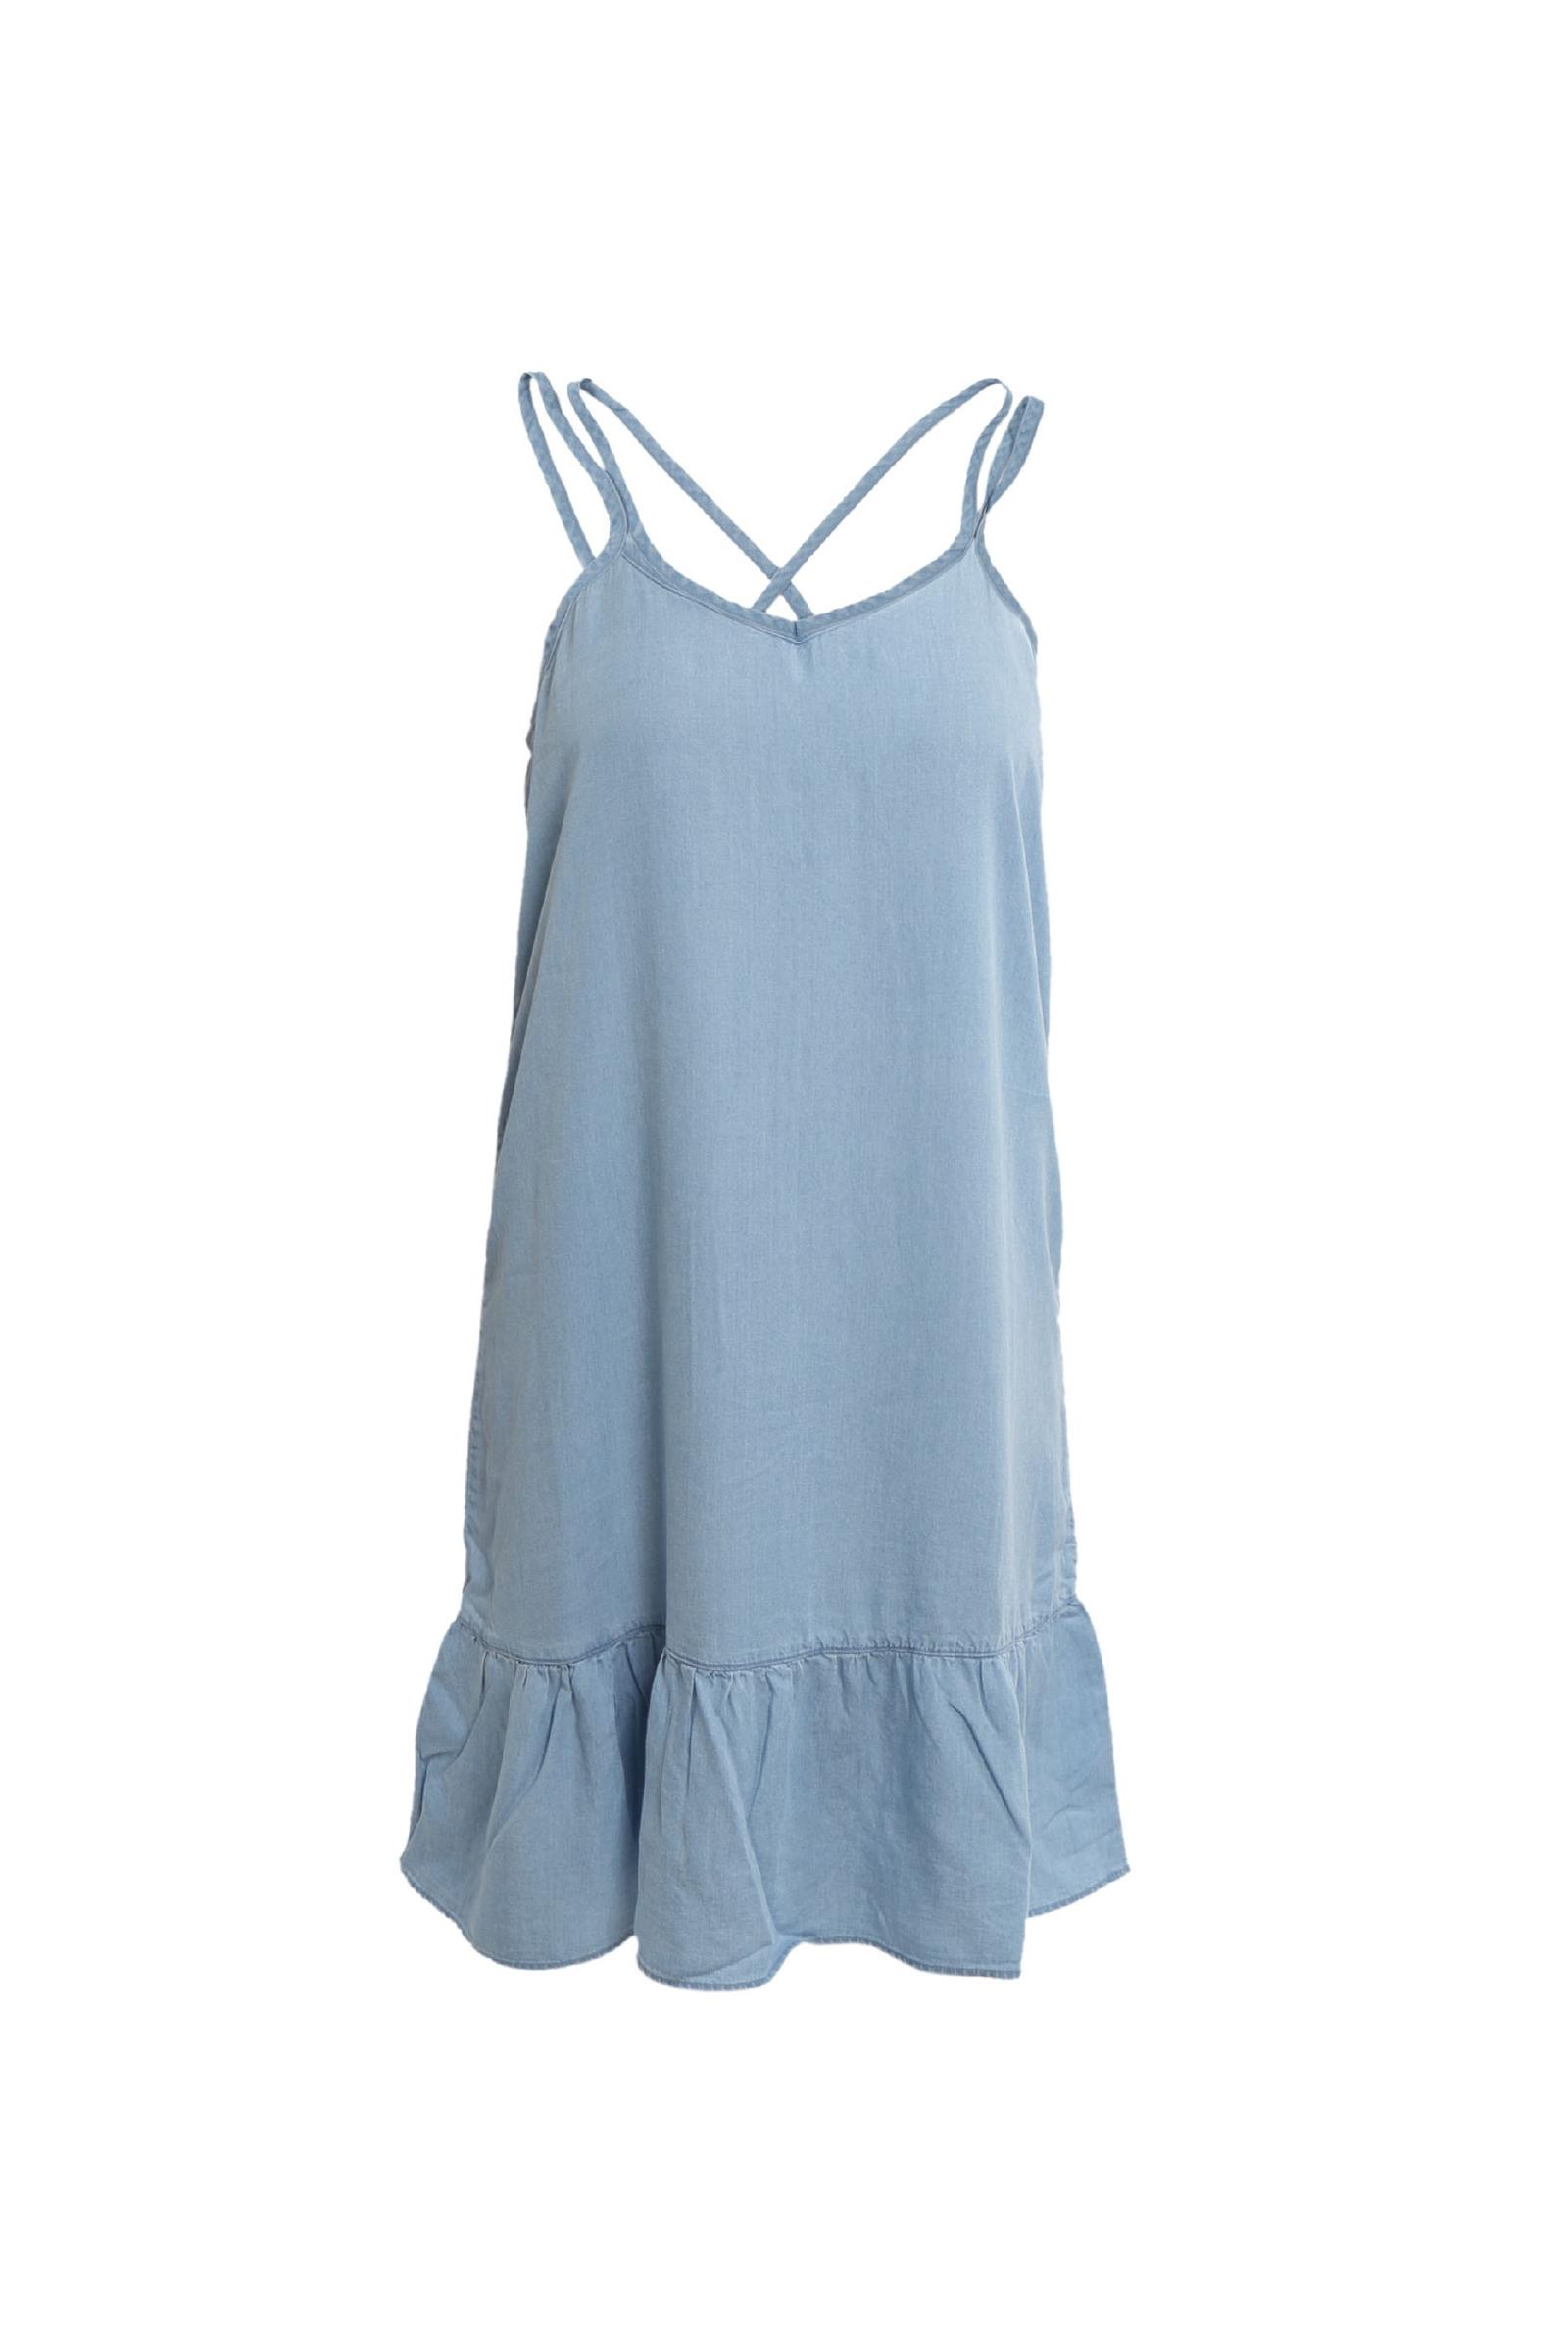 VERO MODA Woman Dress VERO MODA | Dress | 10242286Light Blue Denim